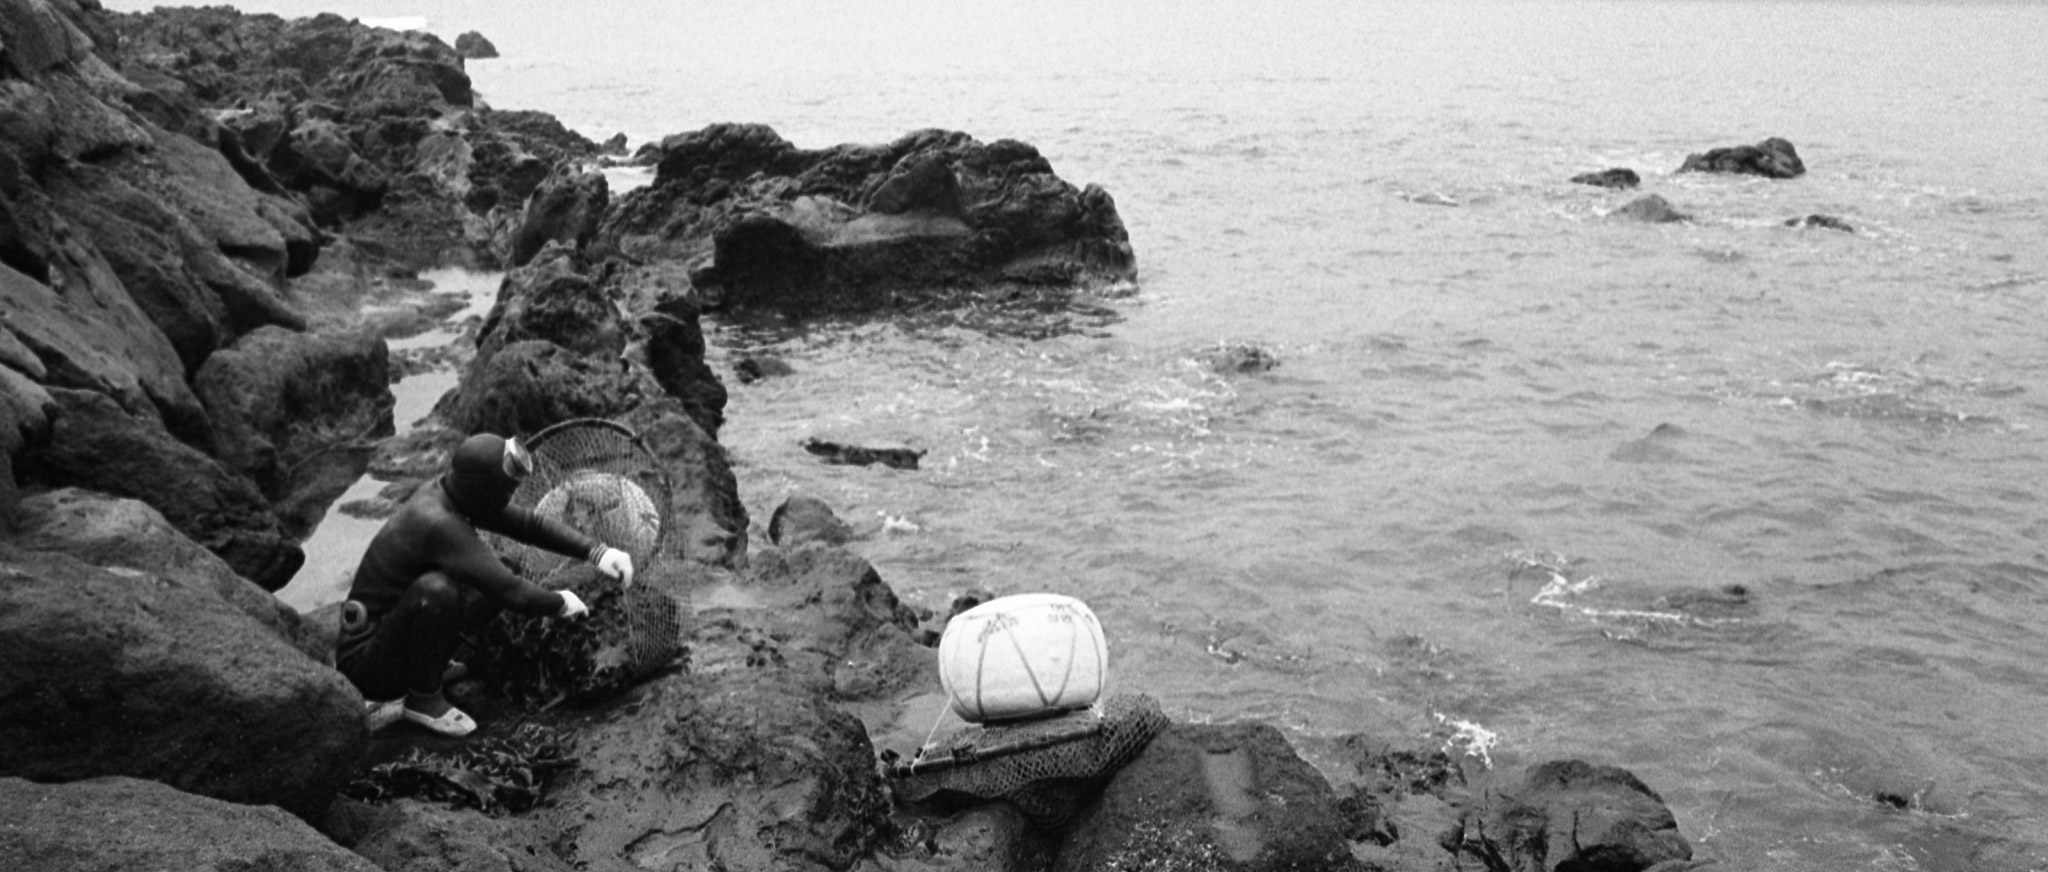 HAENYEO DIVER PREPARING TO DIVE IN JEJU ISLAND, KOREA